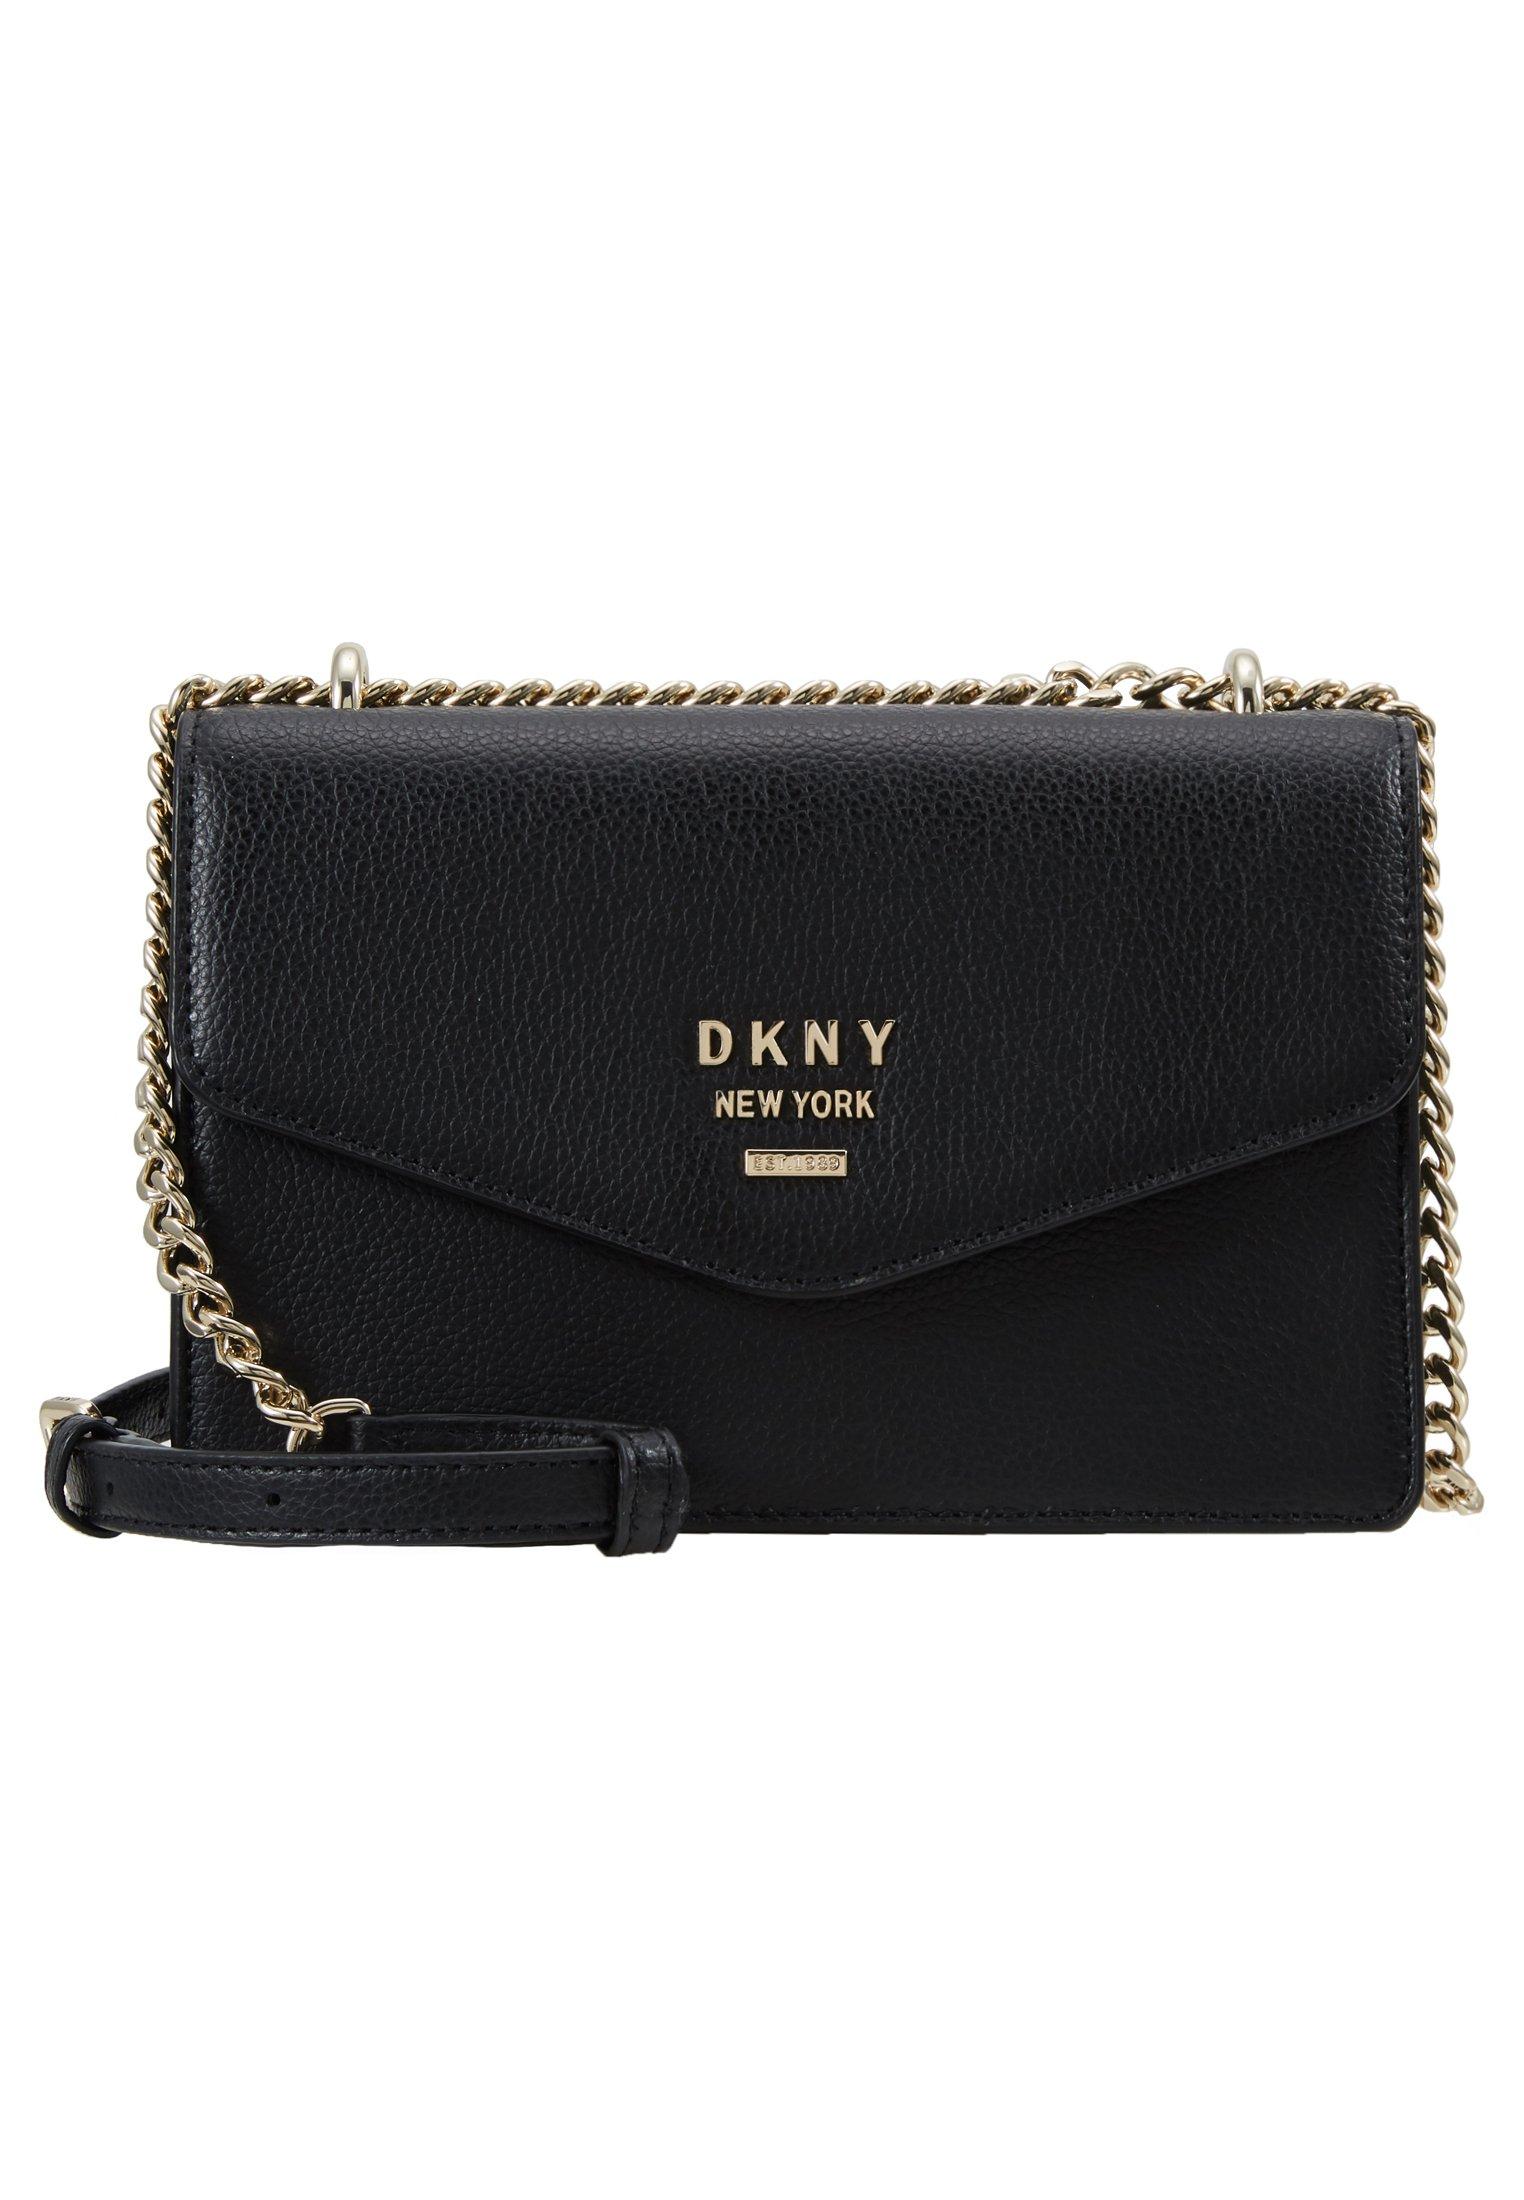 Dkny Whitney - Borsa A Tracolla Black/gold-coloured HvLoeSa